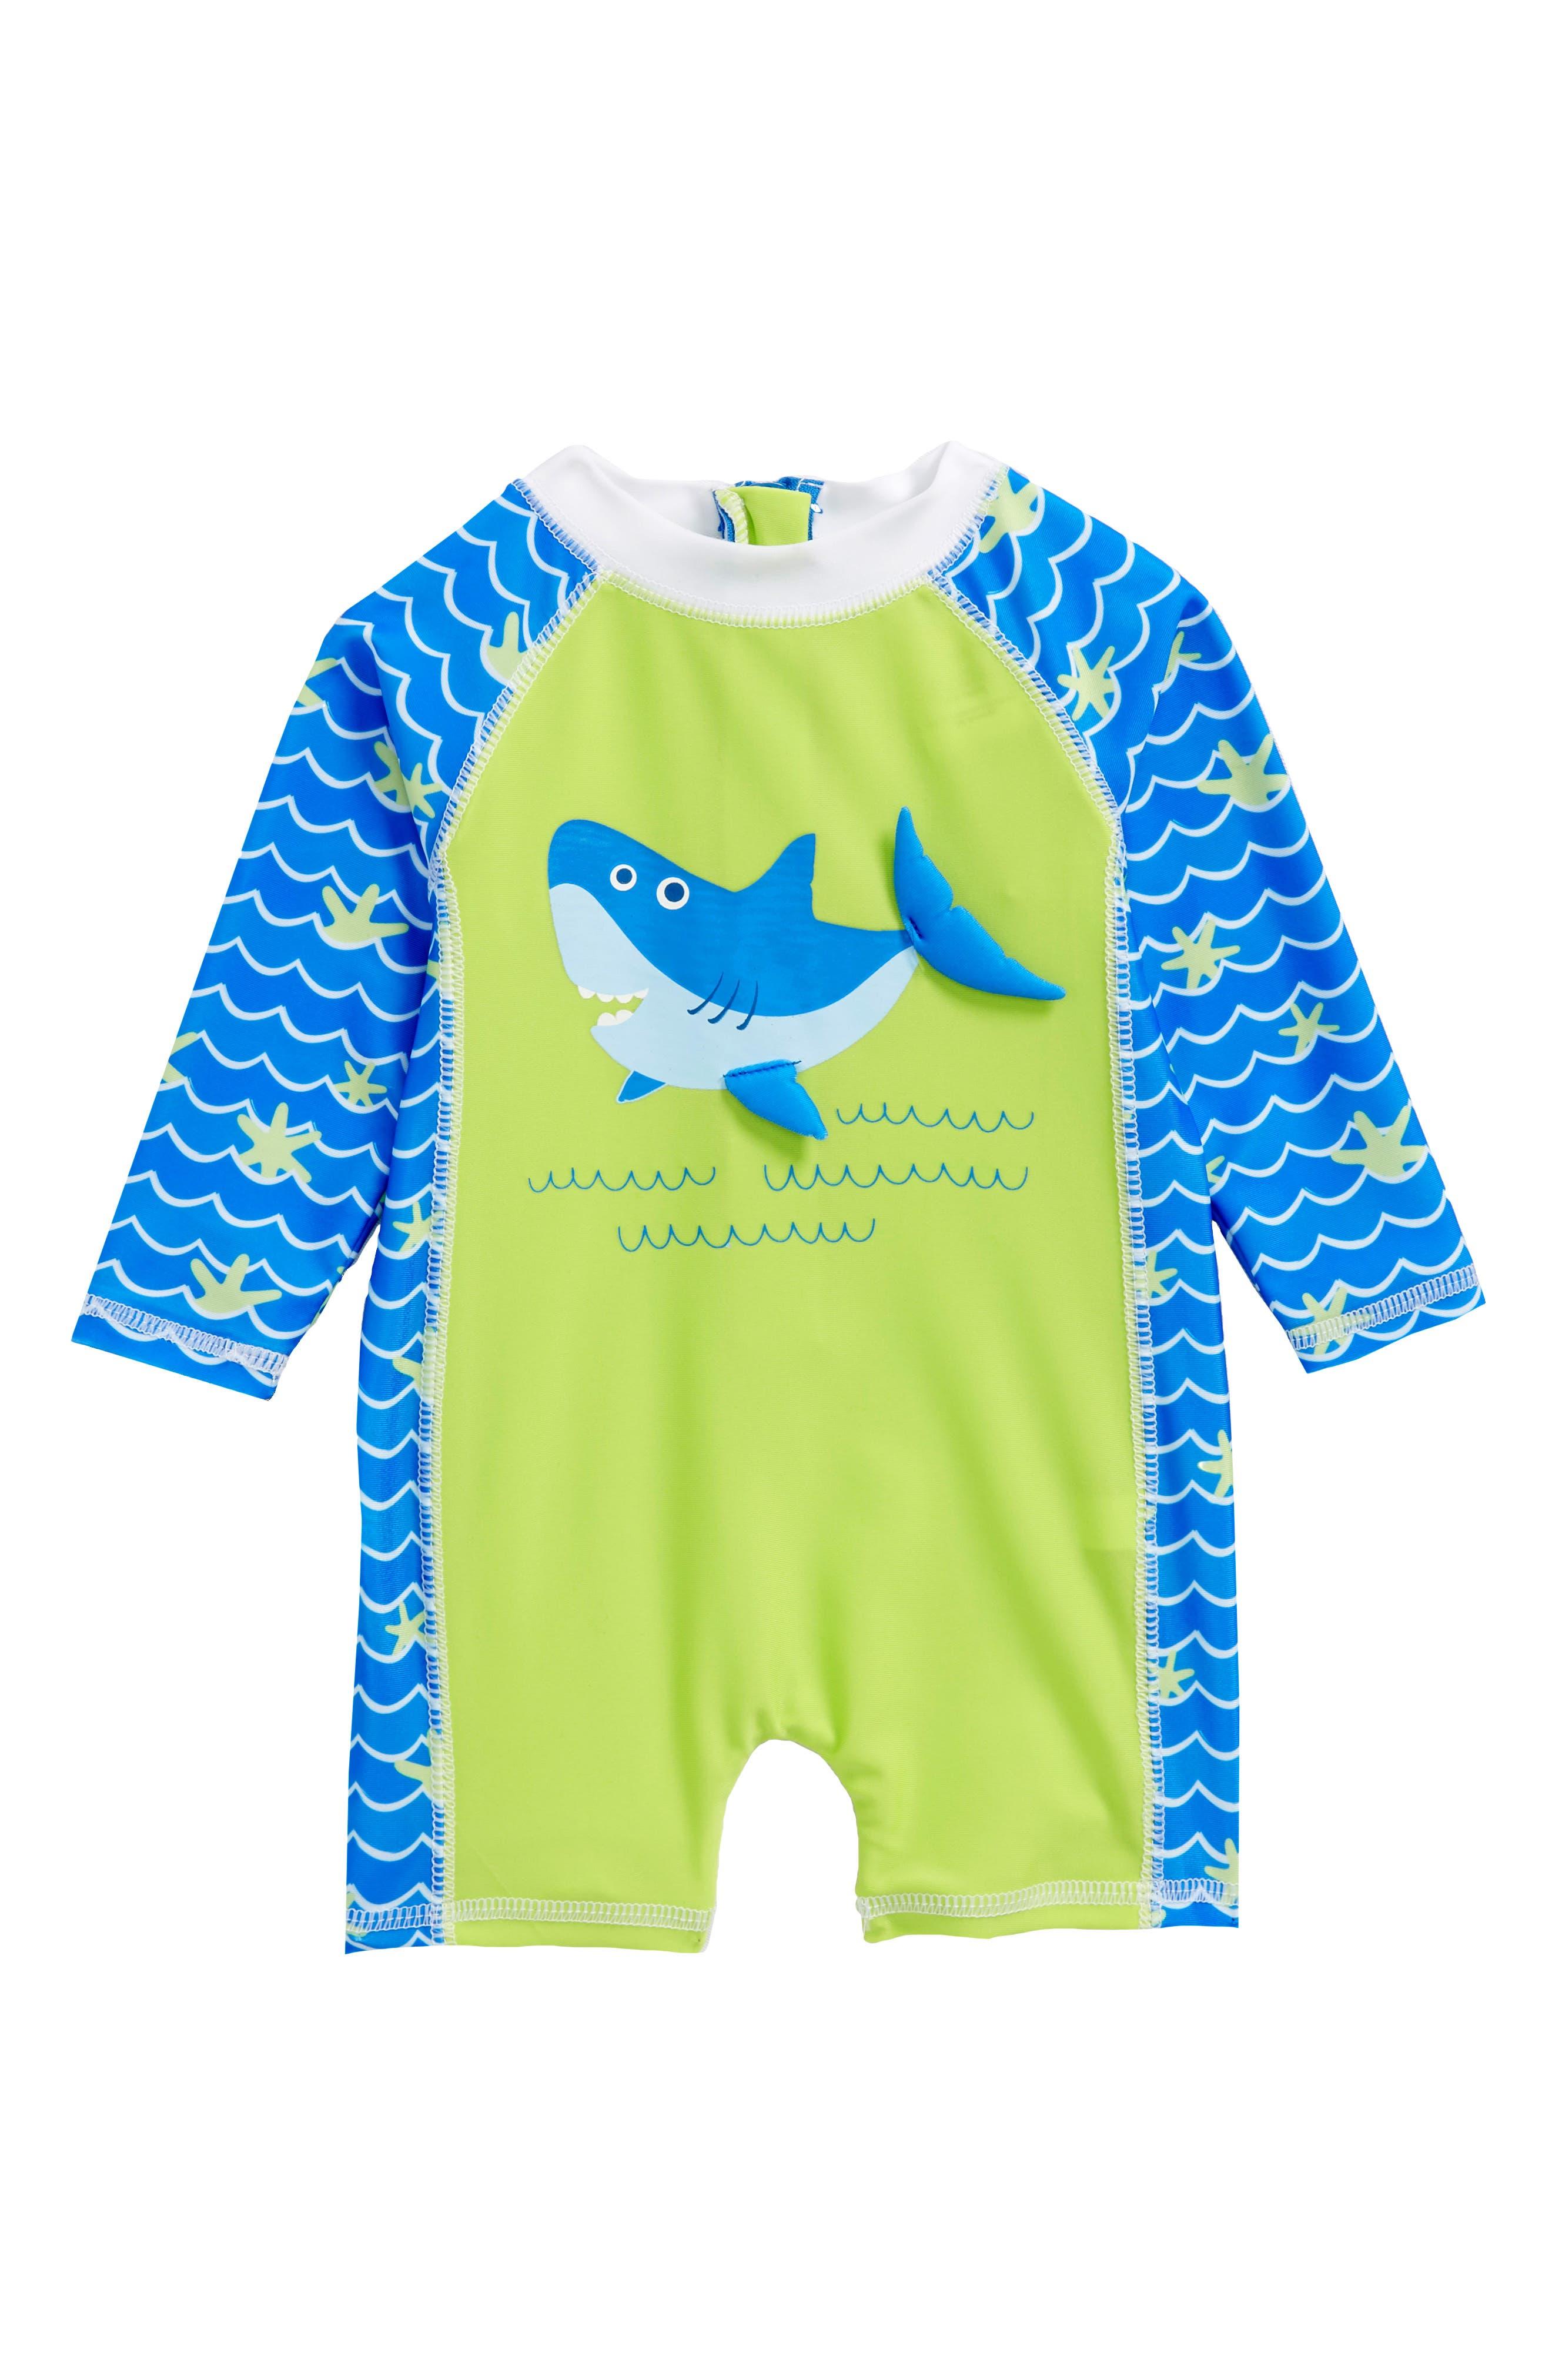 Shark Surf One-Piece Rashguard Swimsuit,                             Main thumbnail 1, color,                             GREEN MULTI